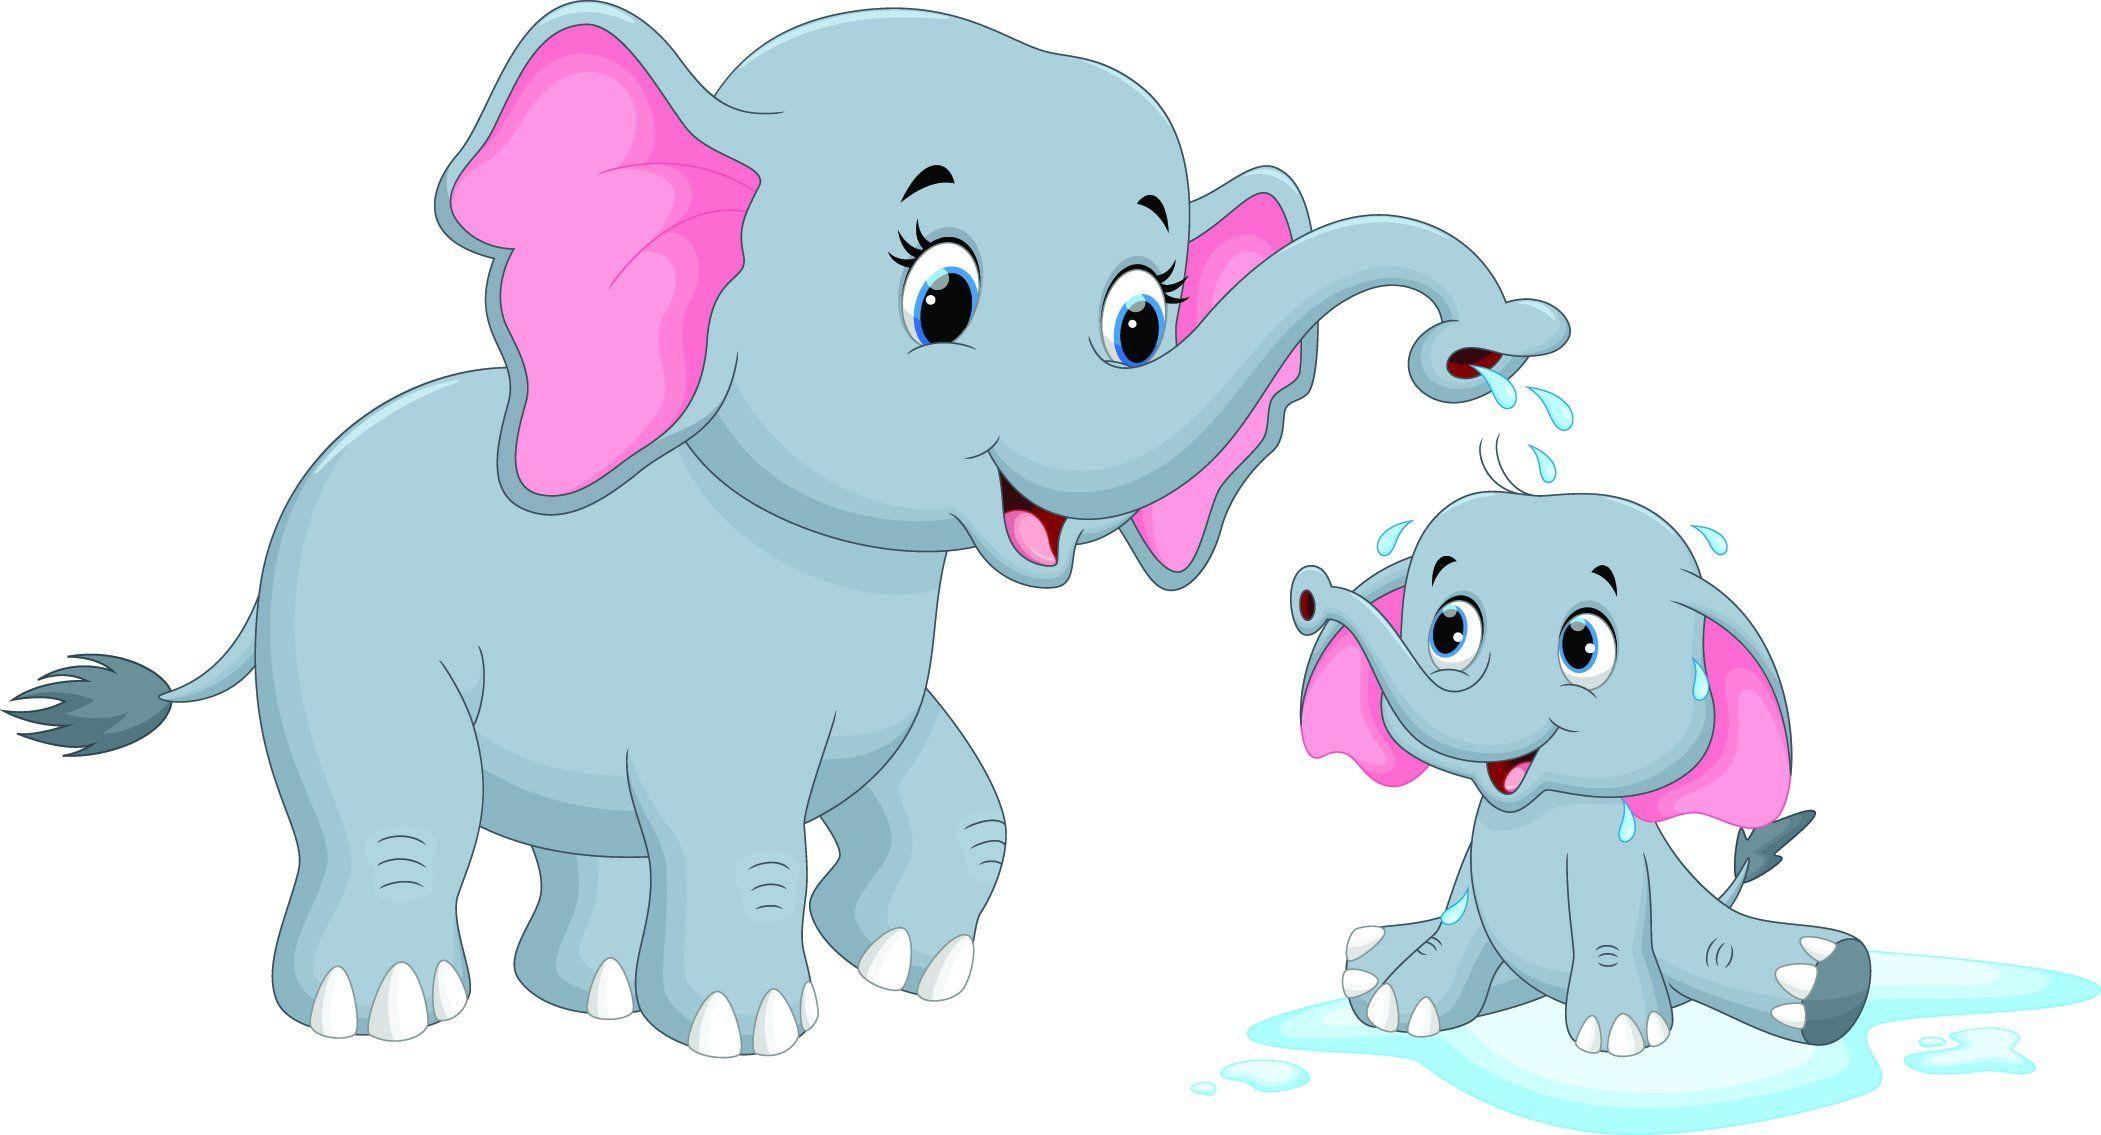 Childrens Fabric Elephant Fabric Mom And Baby Elephant